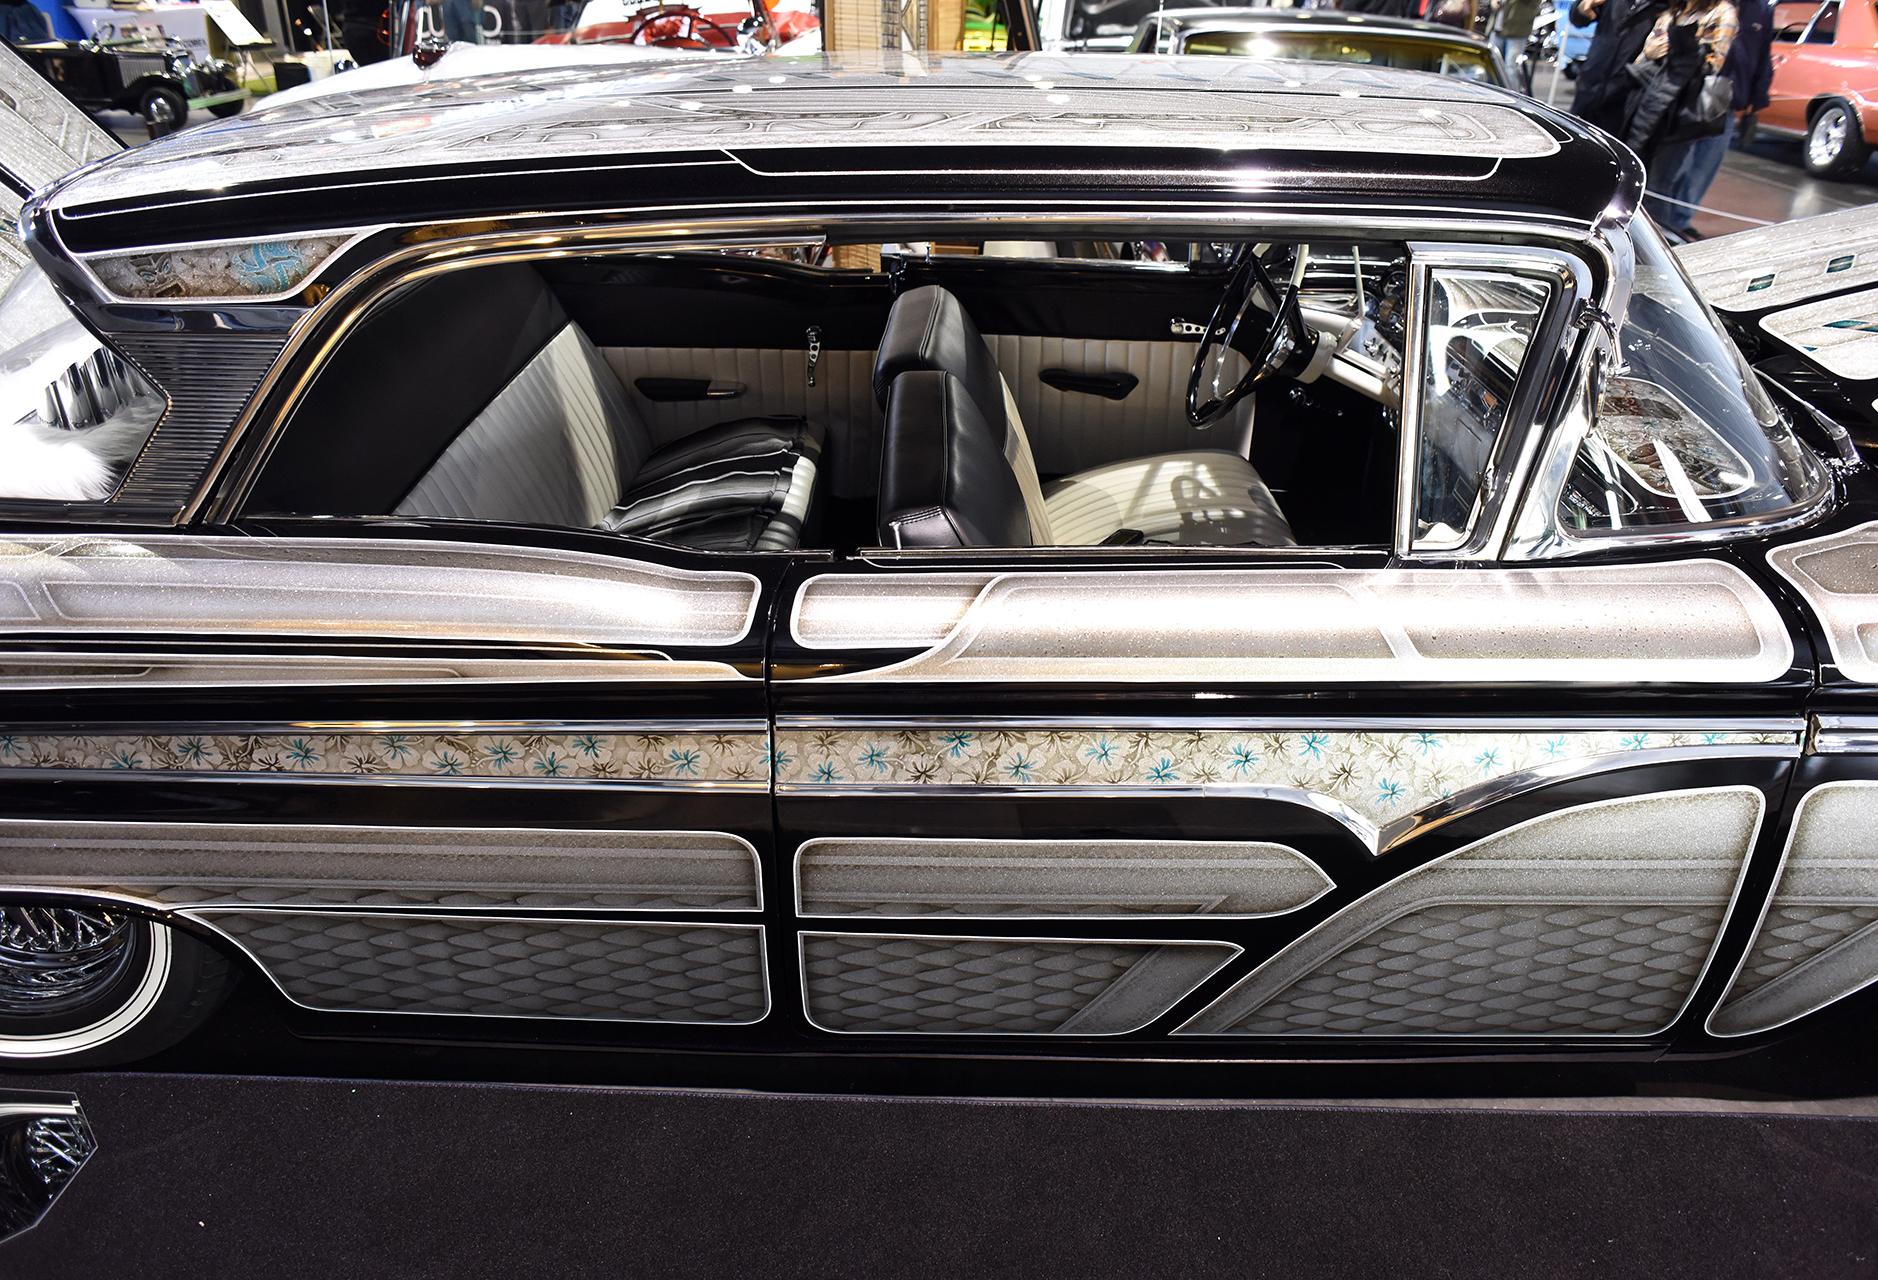 Crazy panel job on an Edsel called Relentless